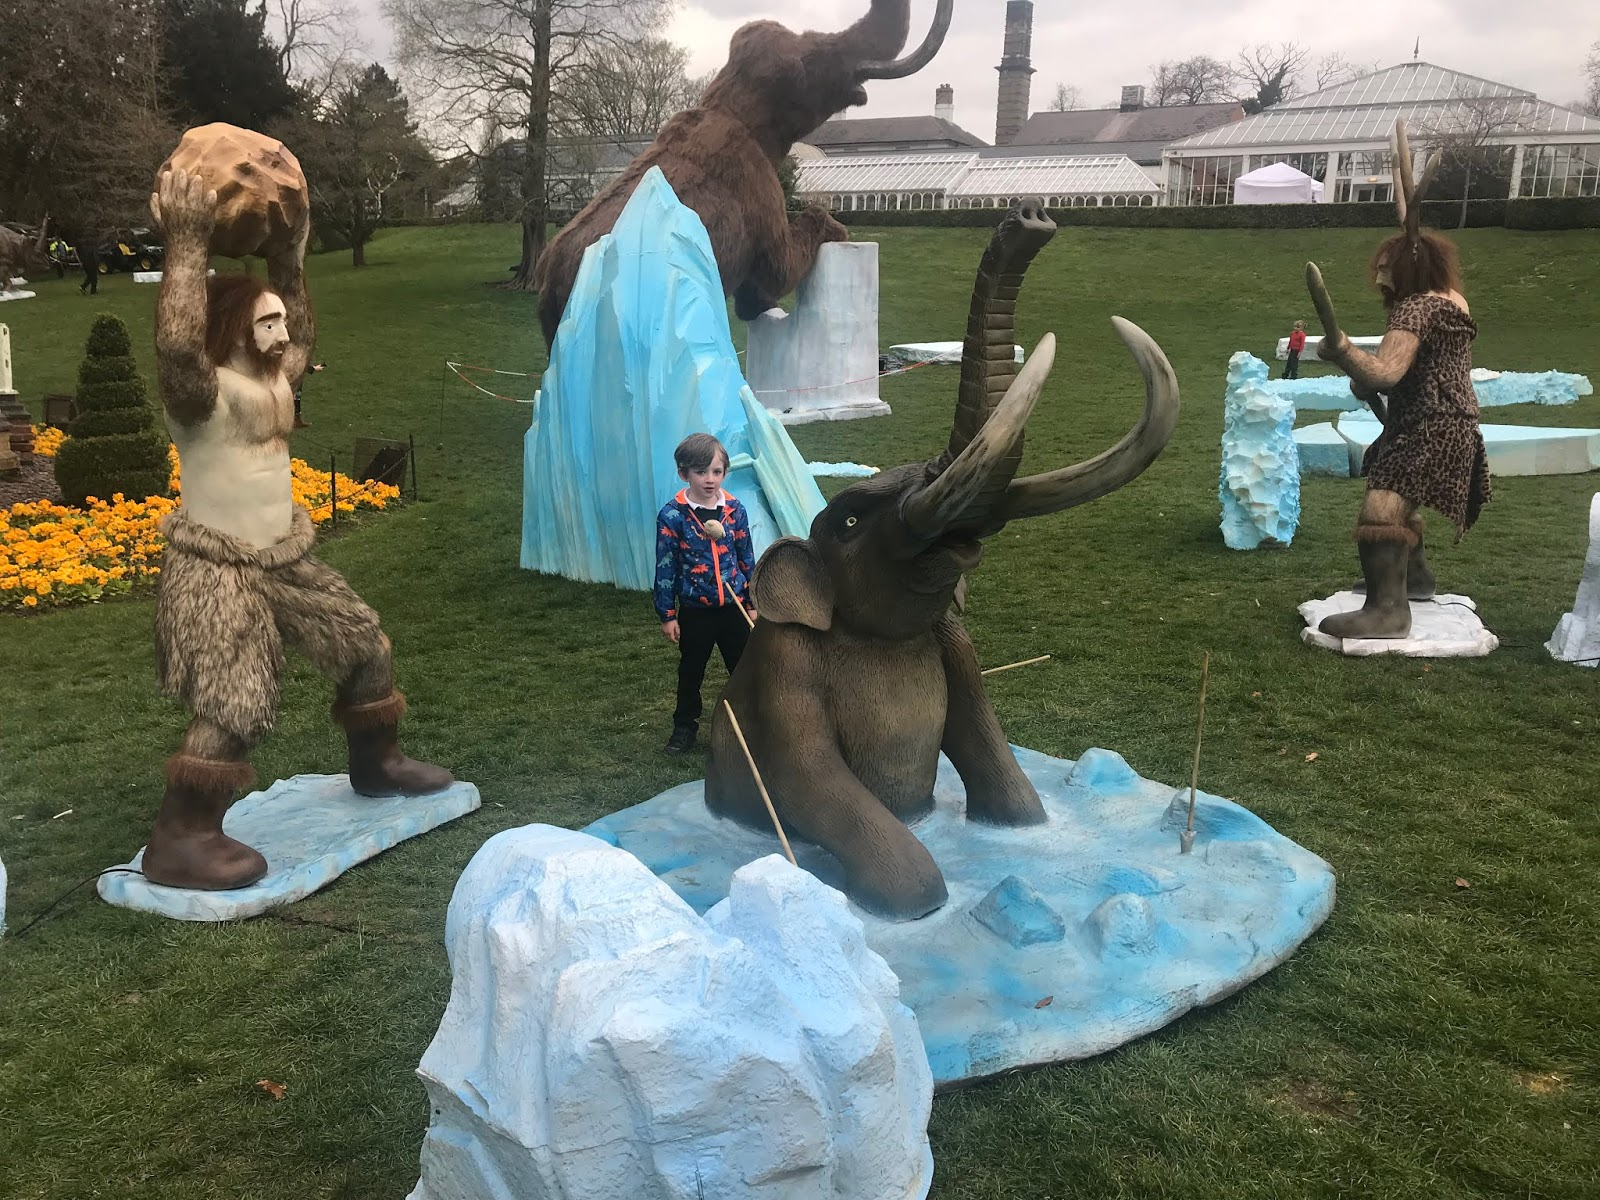 IMG 6629 - Birmingham Botanical Gardens Lantern Festival 2019